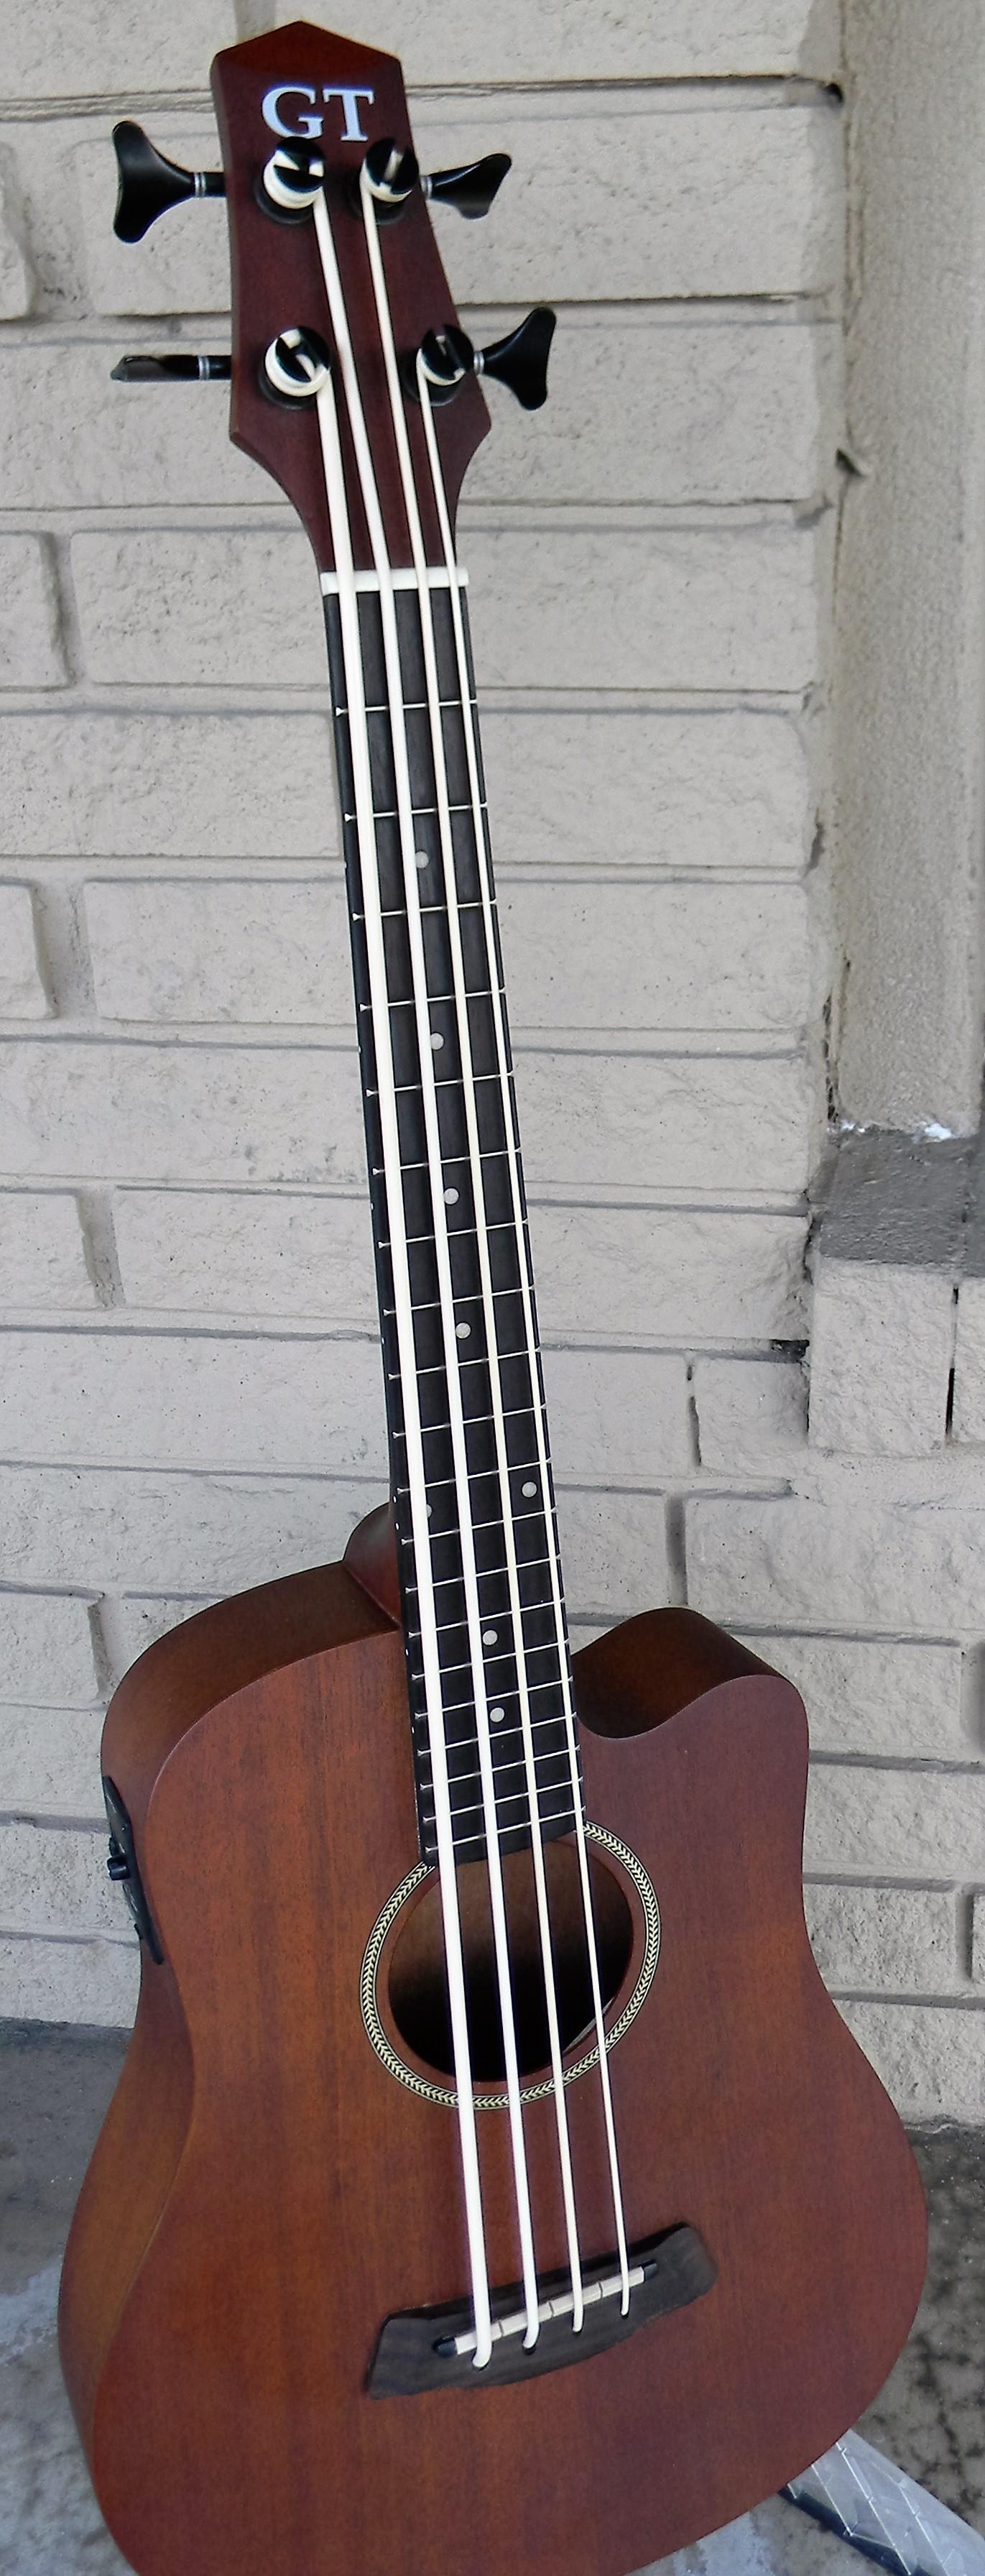 dscn4387 san antonio guitar store guitar tex. Black Bedroom Furniture Sets. Home Design Ideas